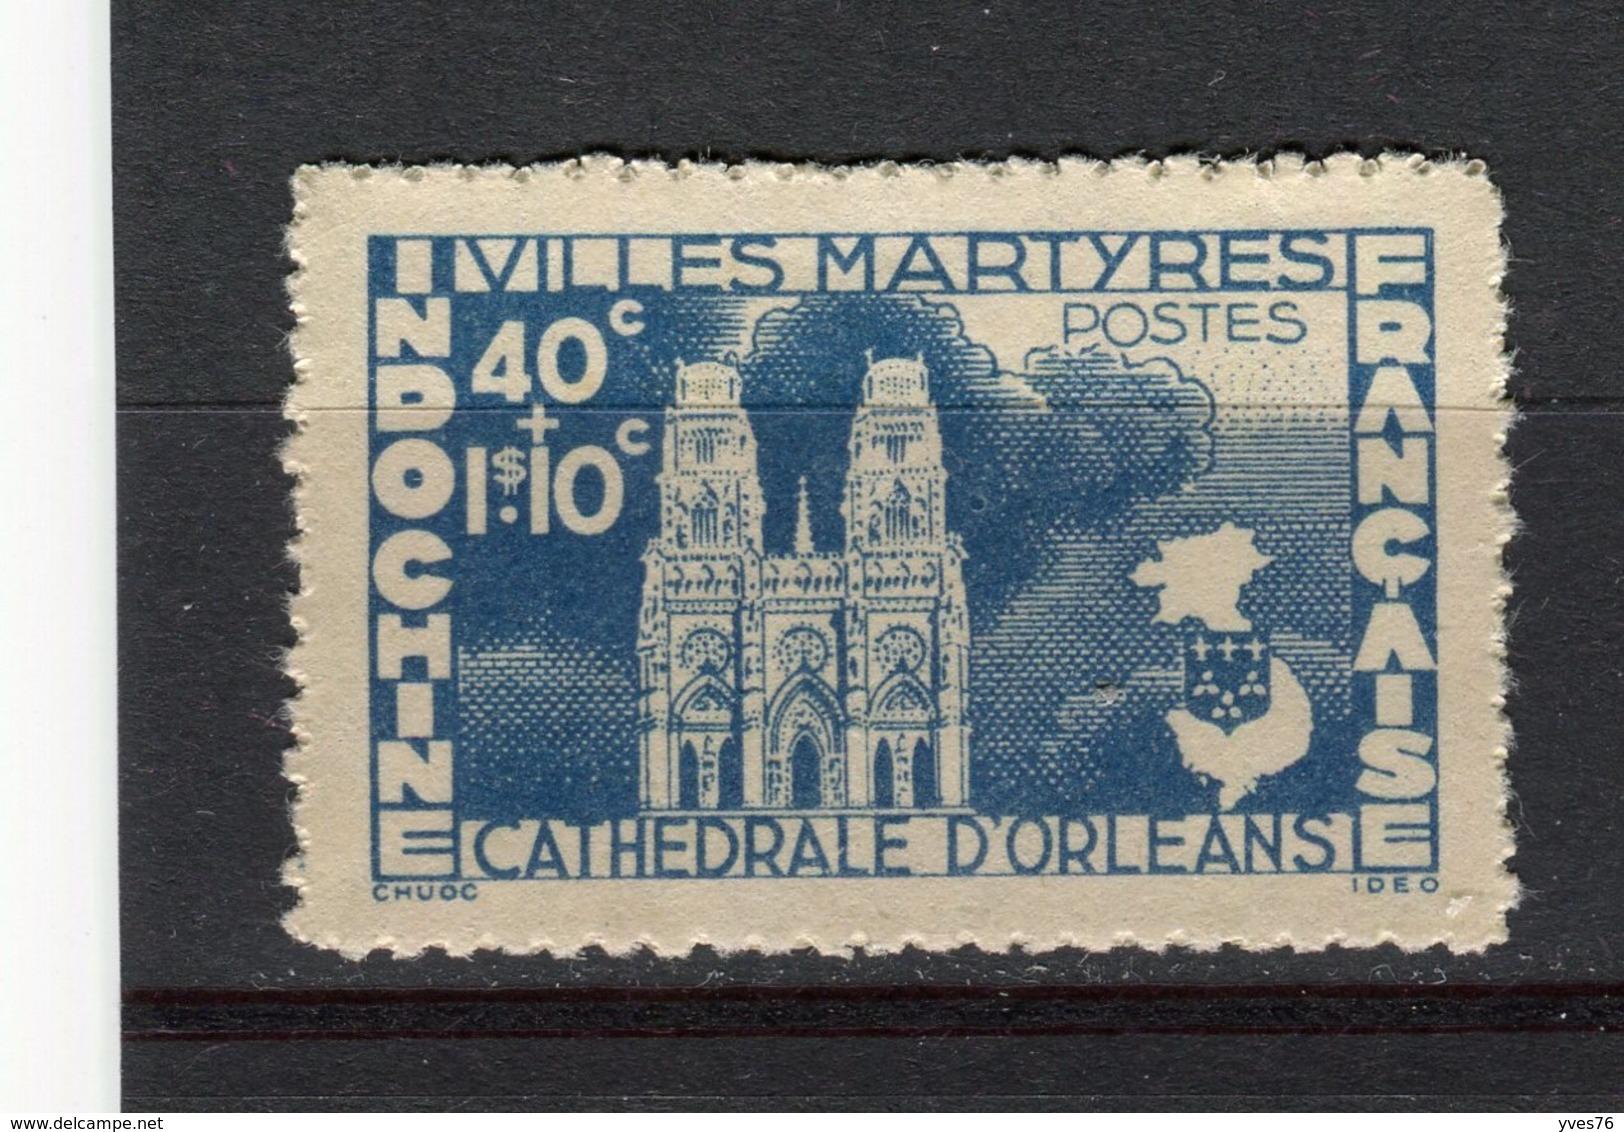 INDOCHINE - Y&T N° 293(*) - Villes Françaises Martyres - Neufs